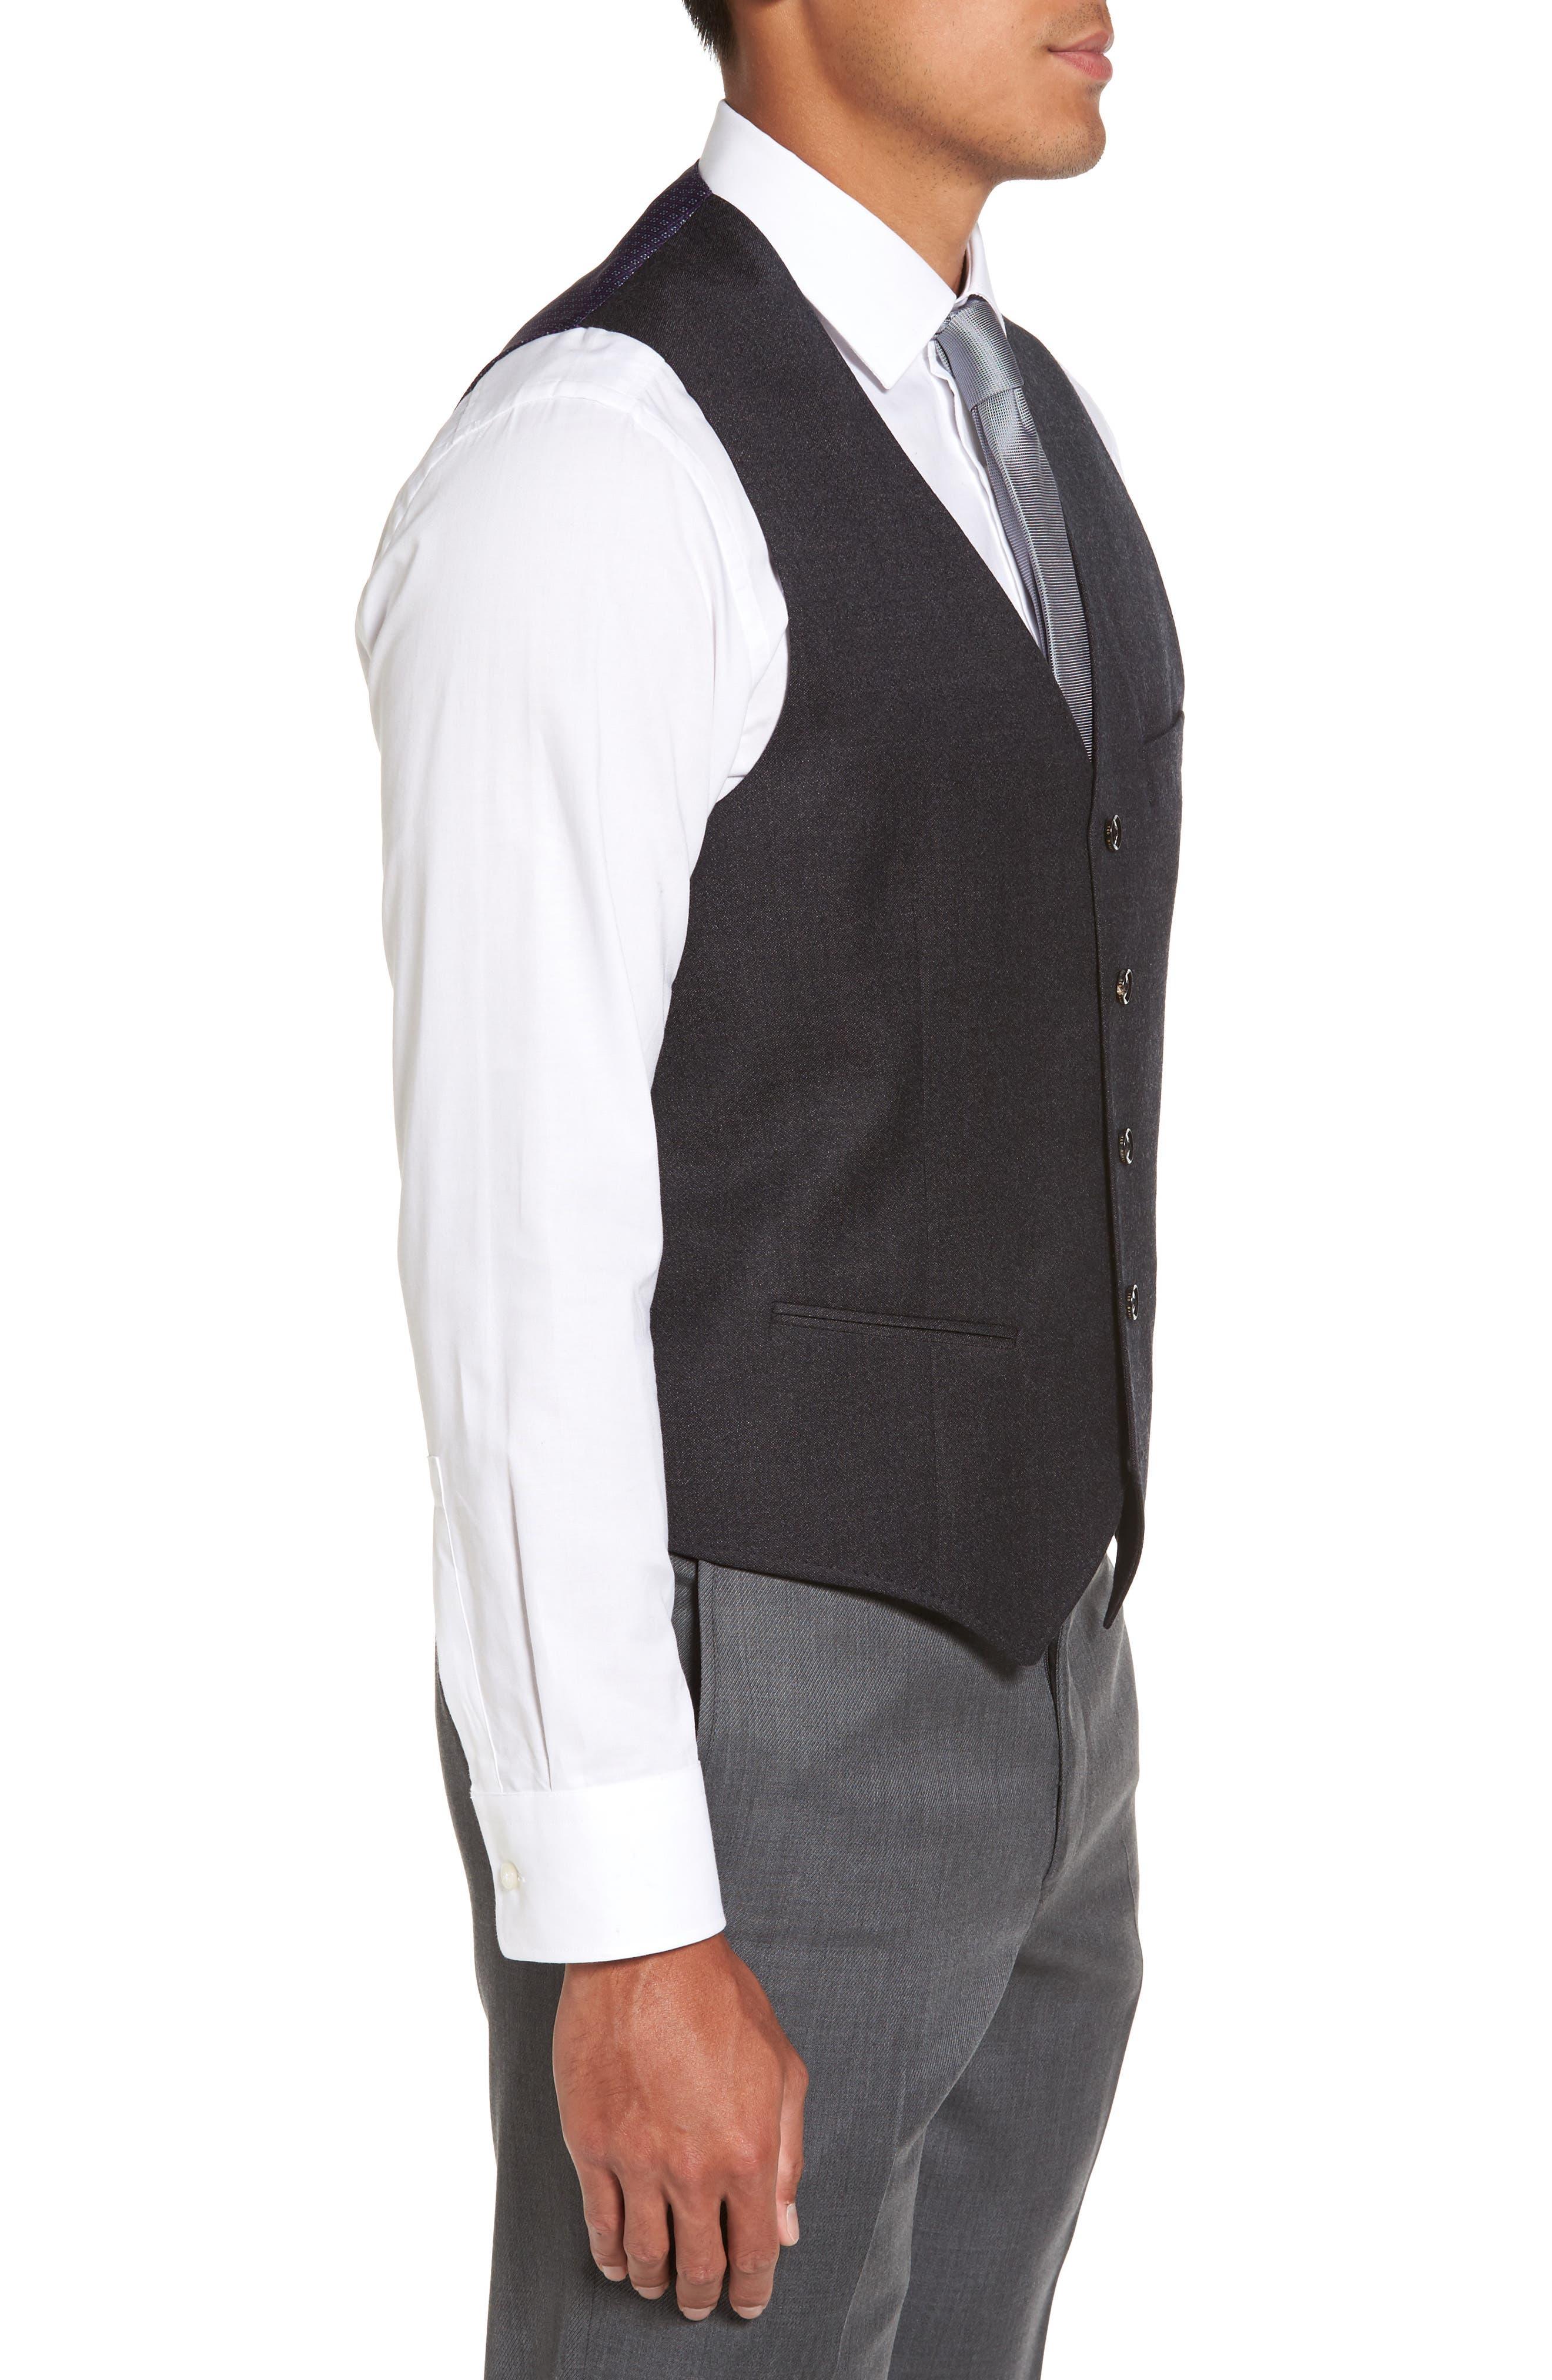 Troy Trim Fit Solid Wool Vest,                             Alternate thumbnail 3, color,                             502